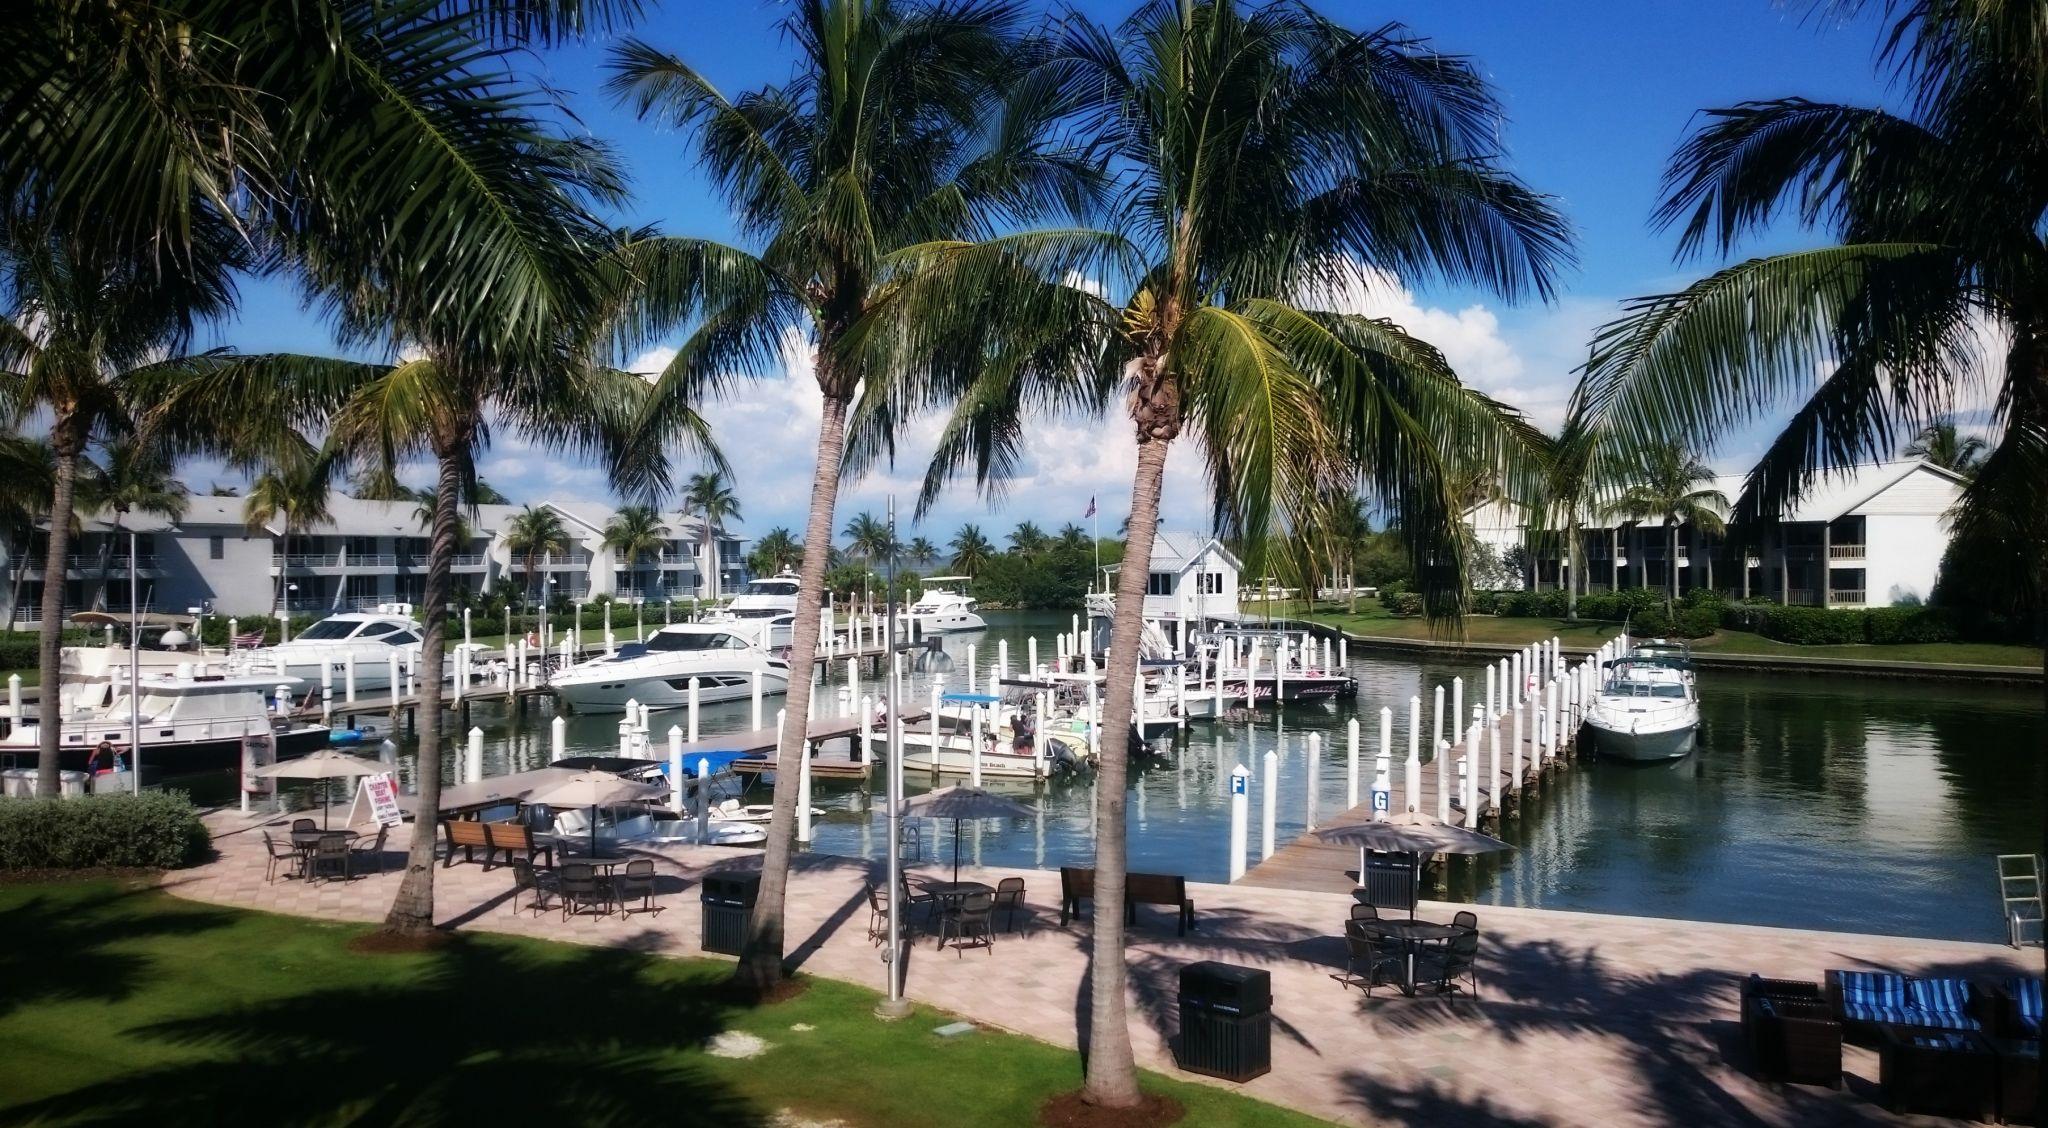 South Seas Island Resort Captiva Island Florida Beyond